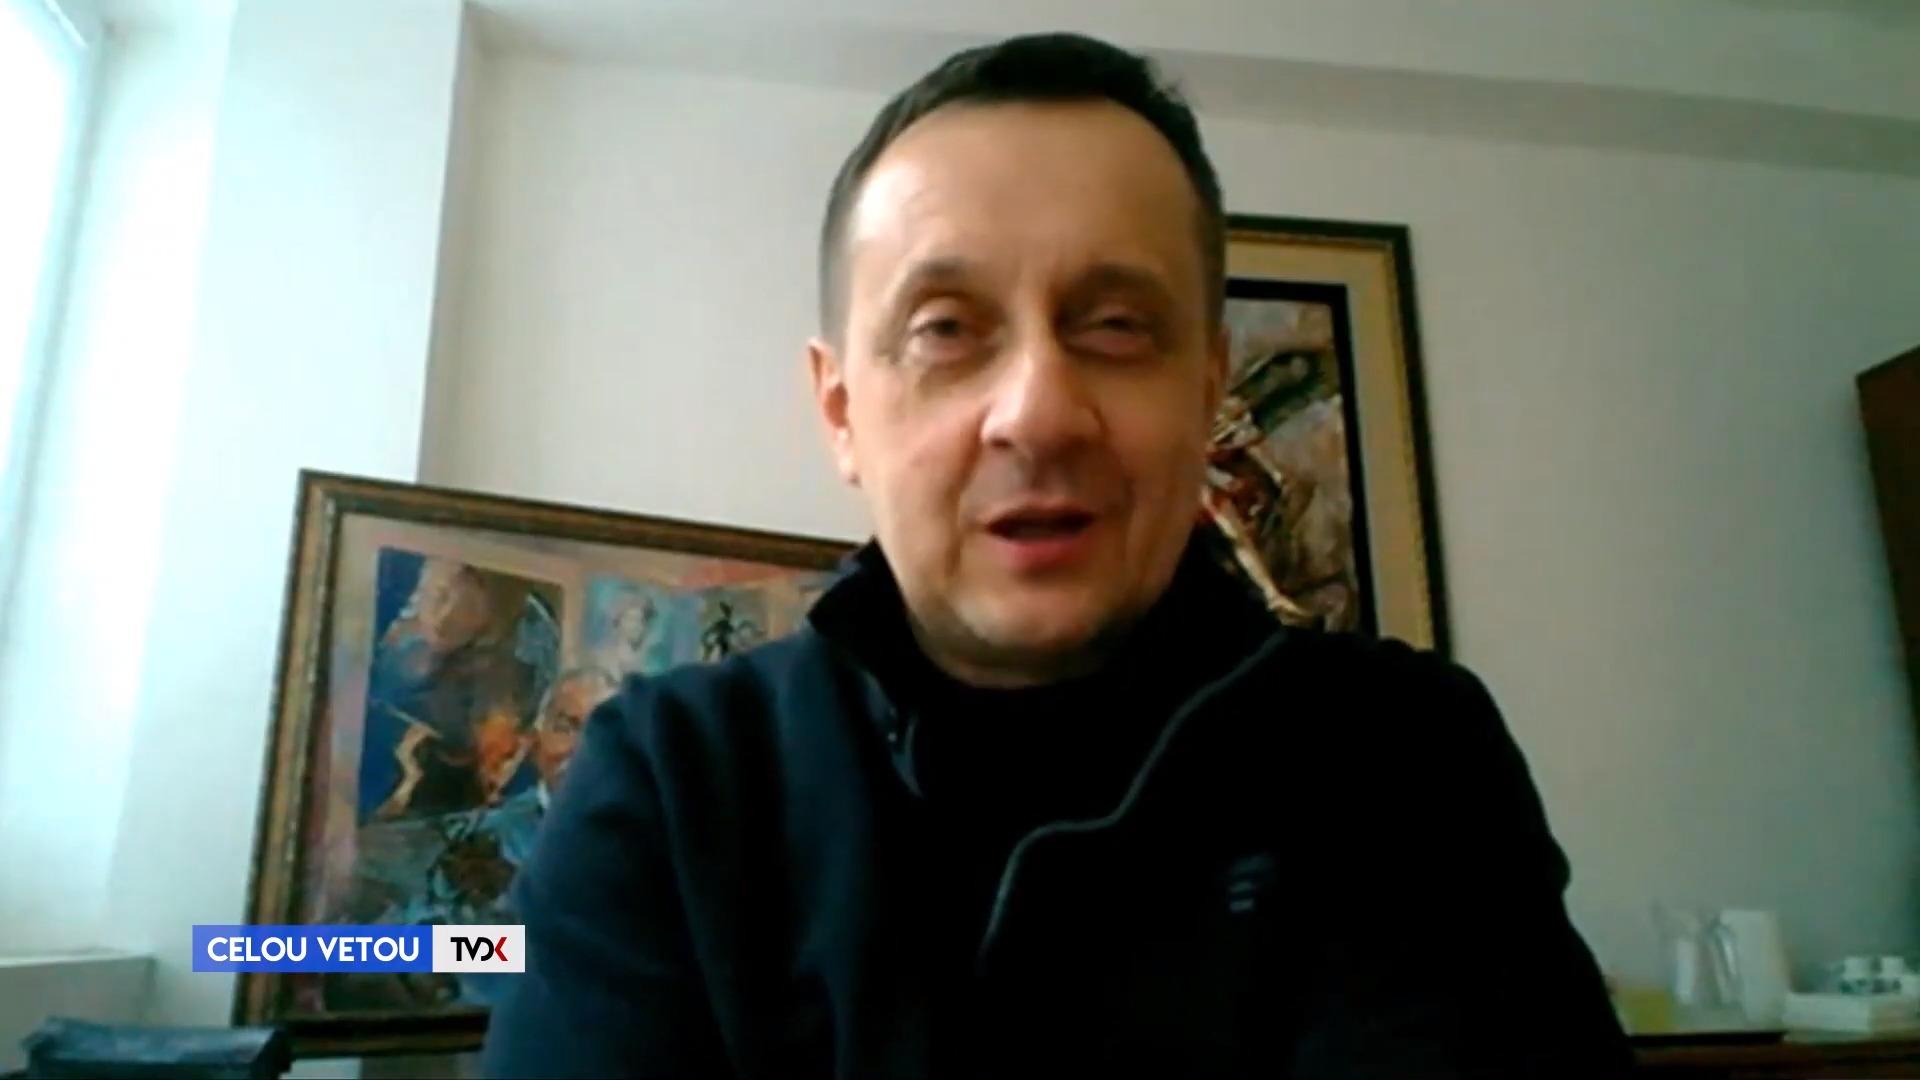 Ján Riapoš